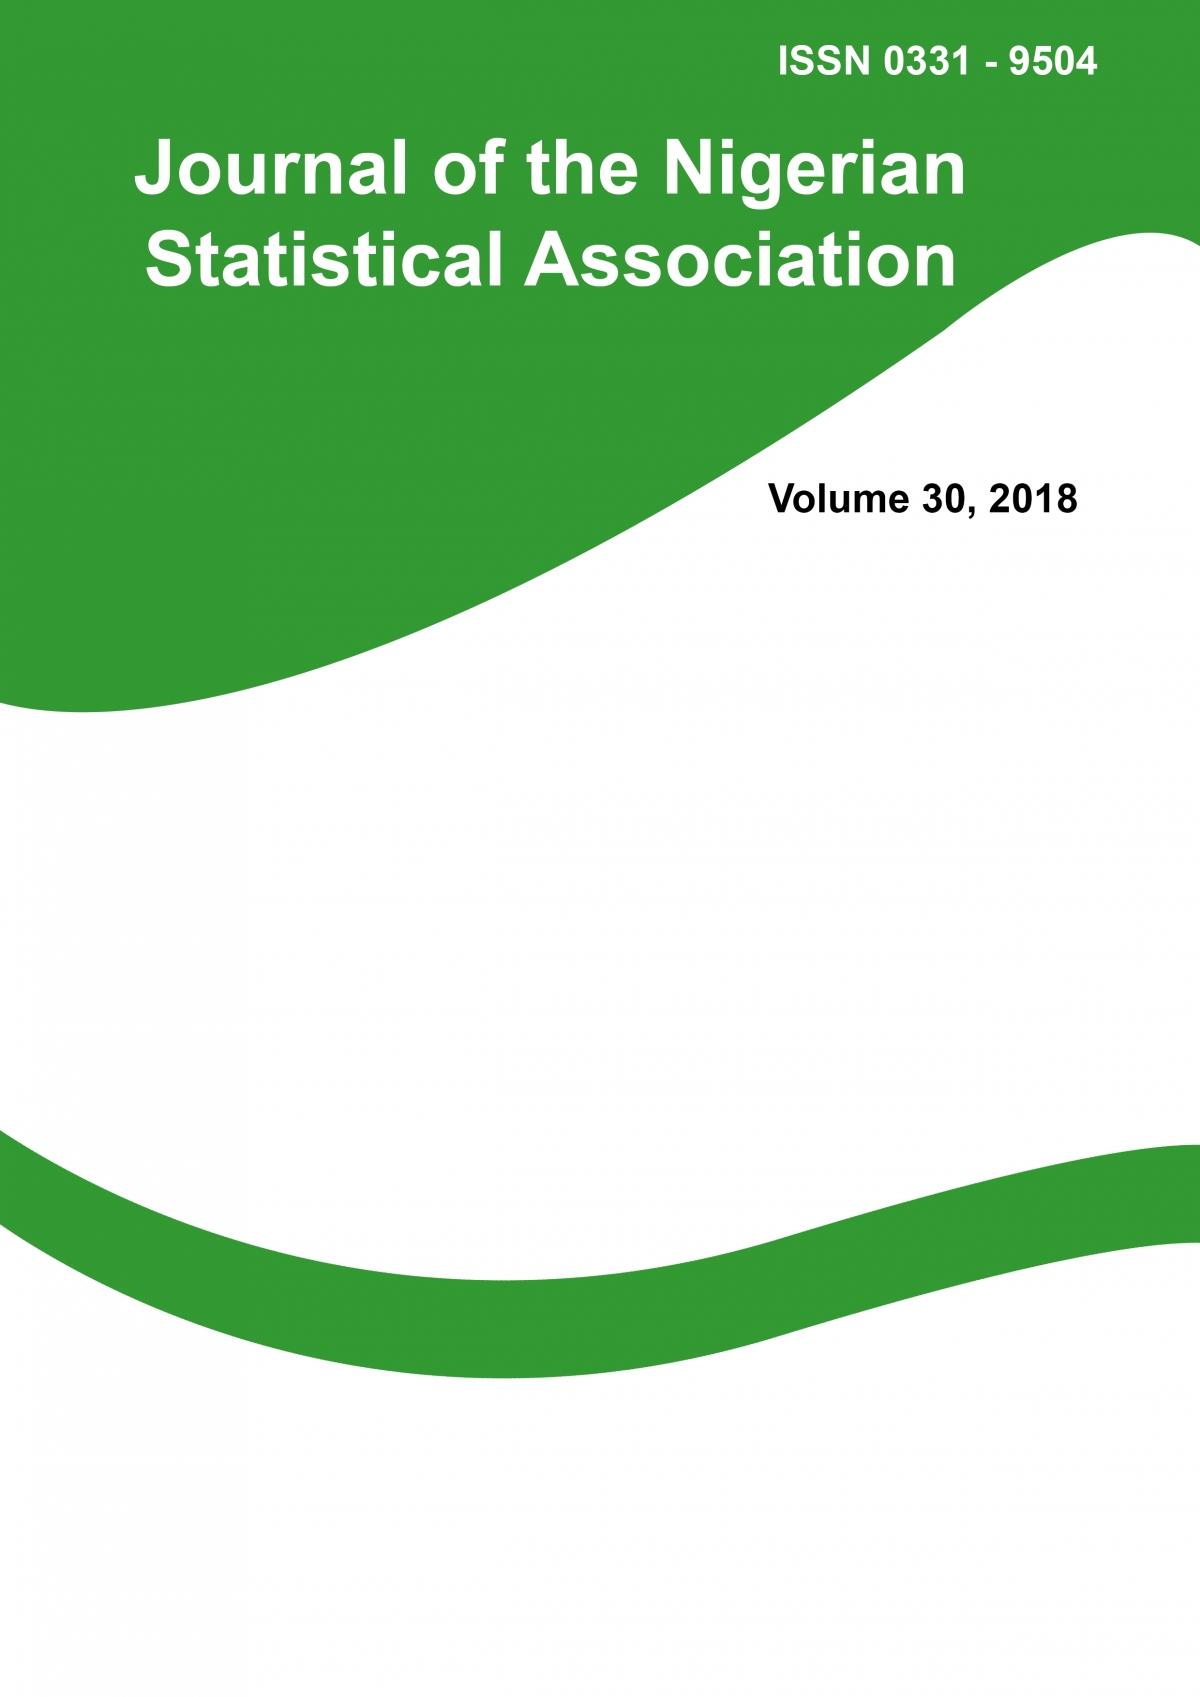 NSA Journal 2018 Vol. 29